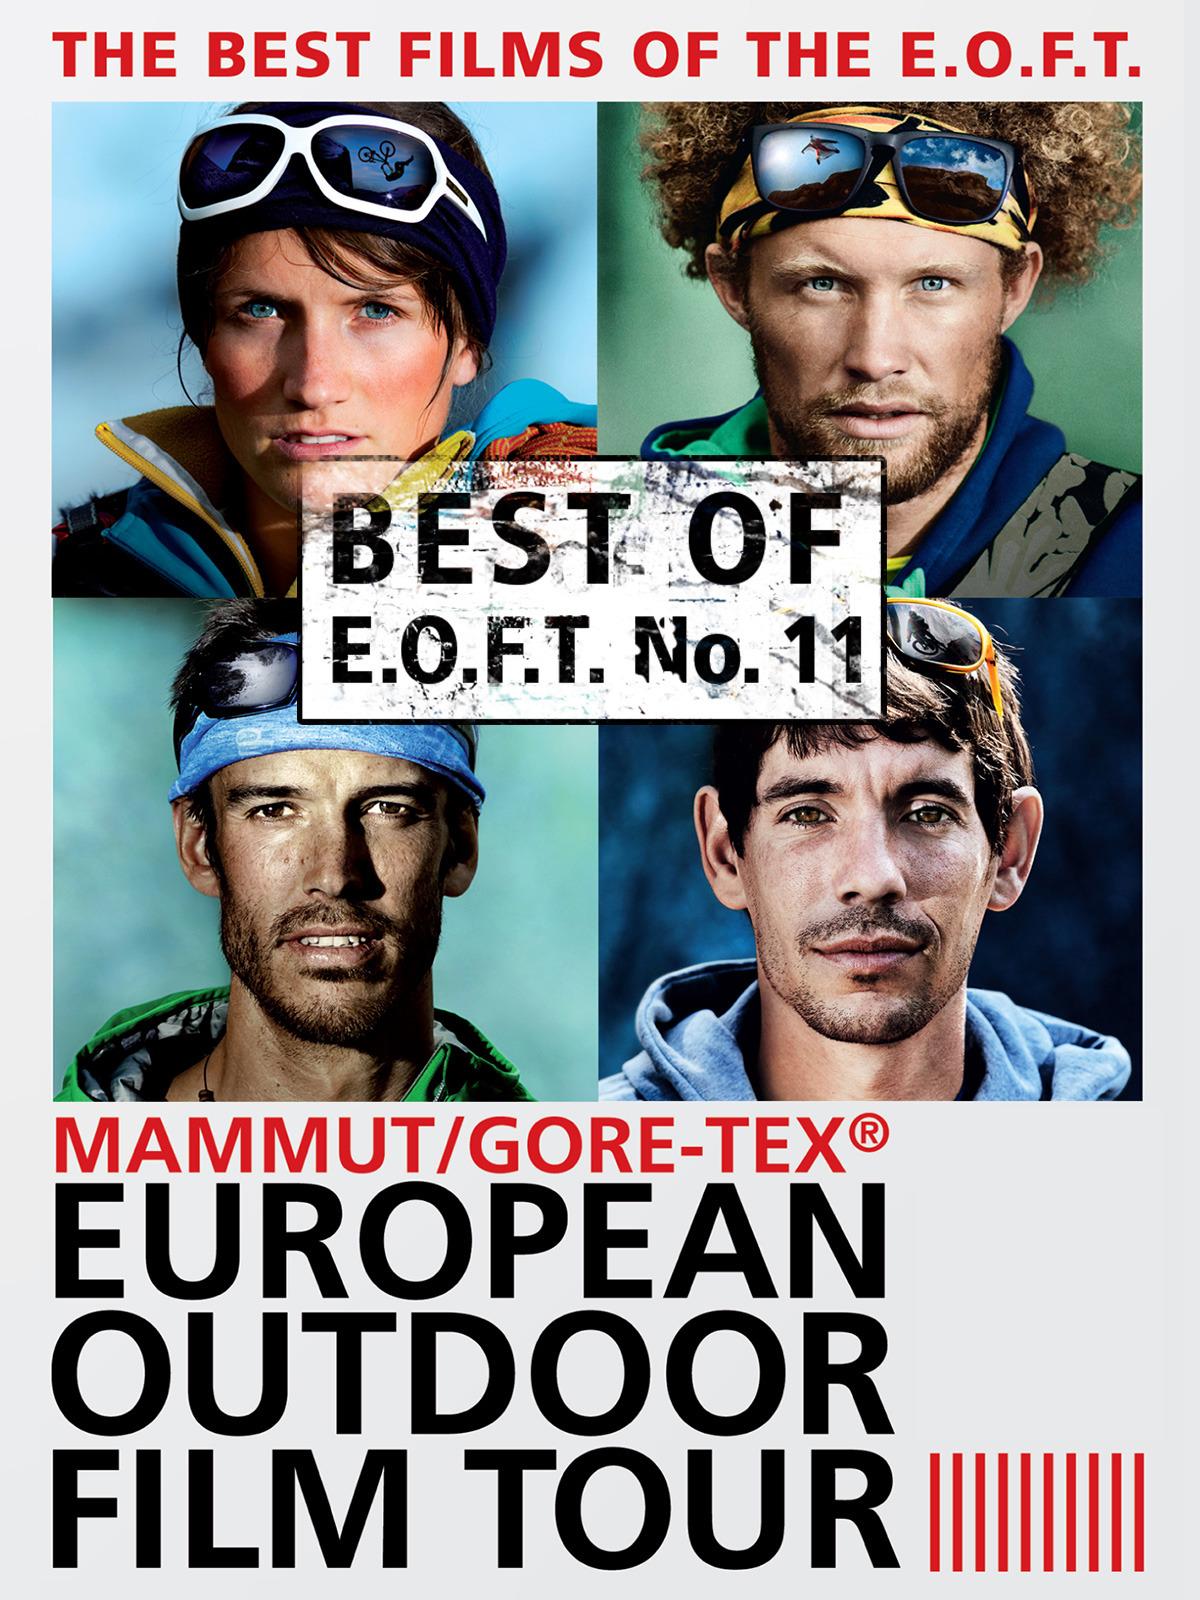 Best of E.O.F.T. No. 11